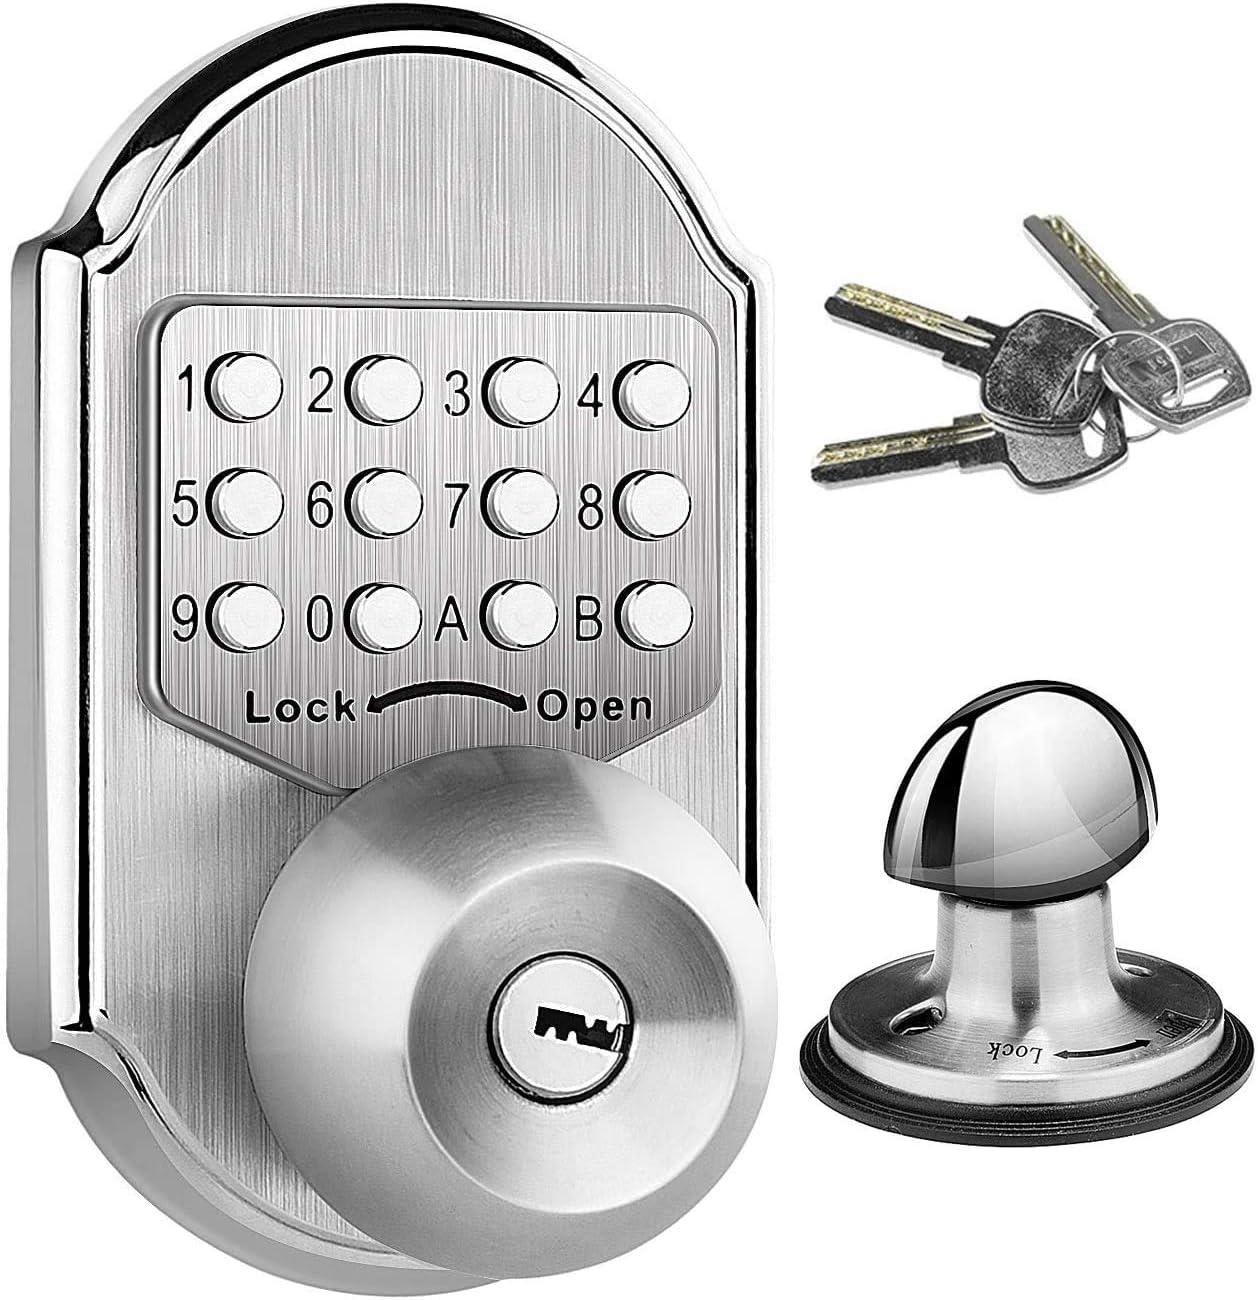 Elemake Keyless Door Lock Deadbolt Entry Door Knob Keypad Digital Combination Higher Security Keypad Door Knob Mechanical Stainless Steel #304 (Pass Code or Key )